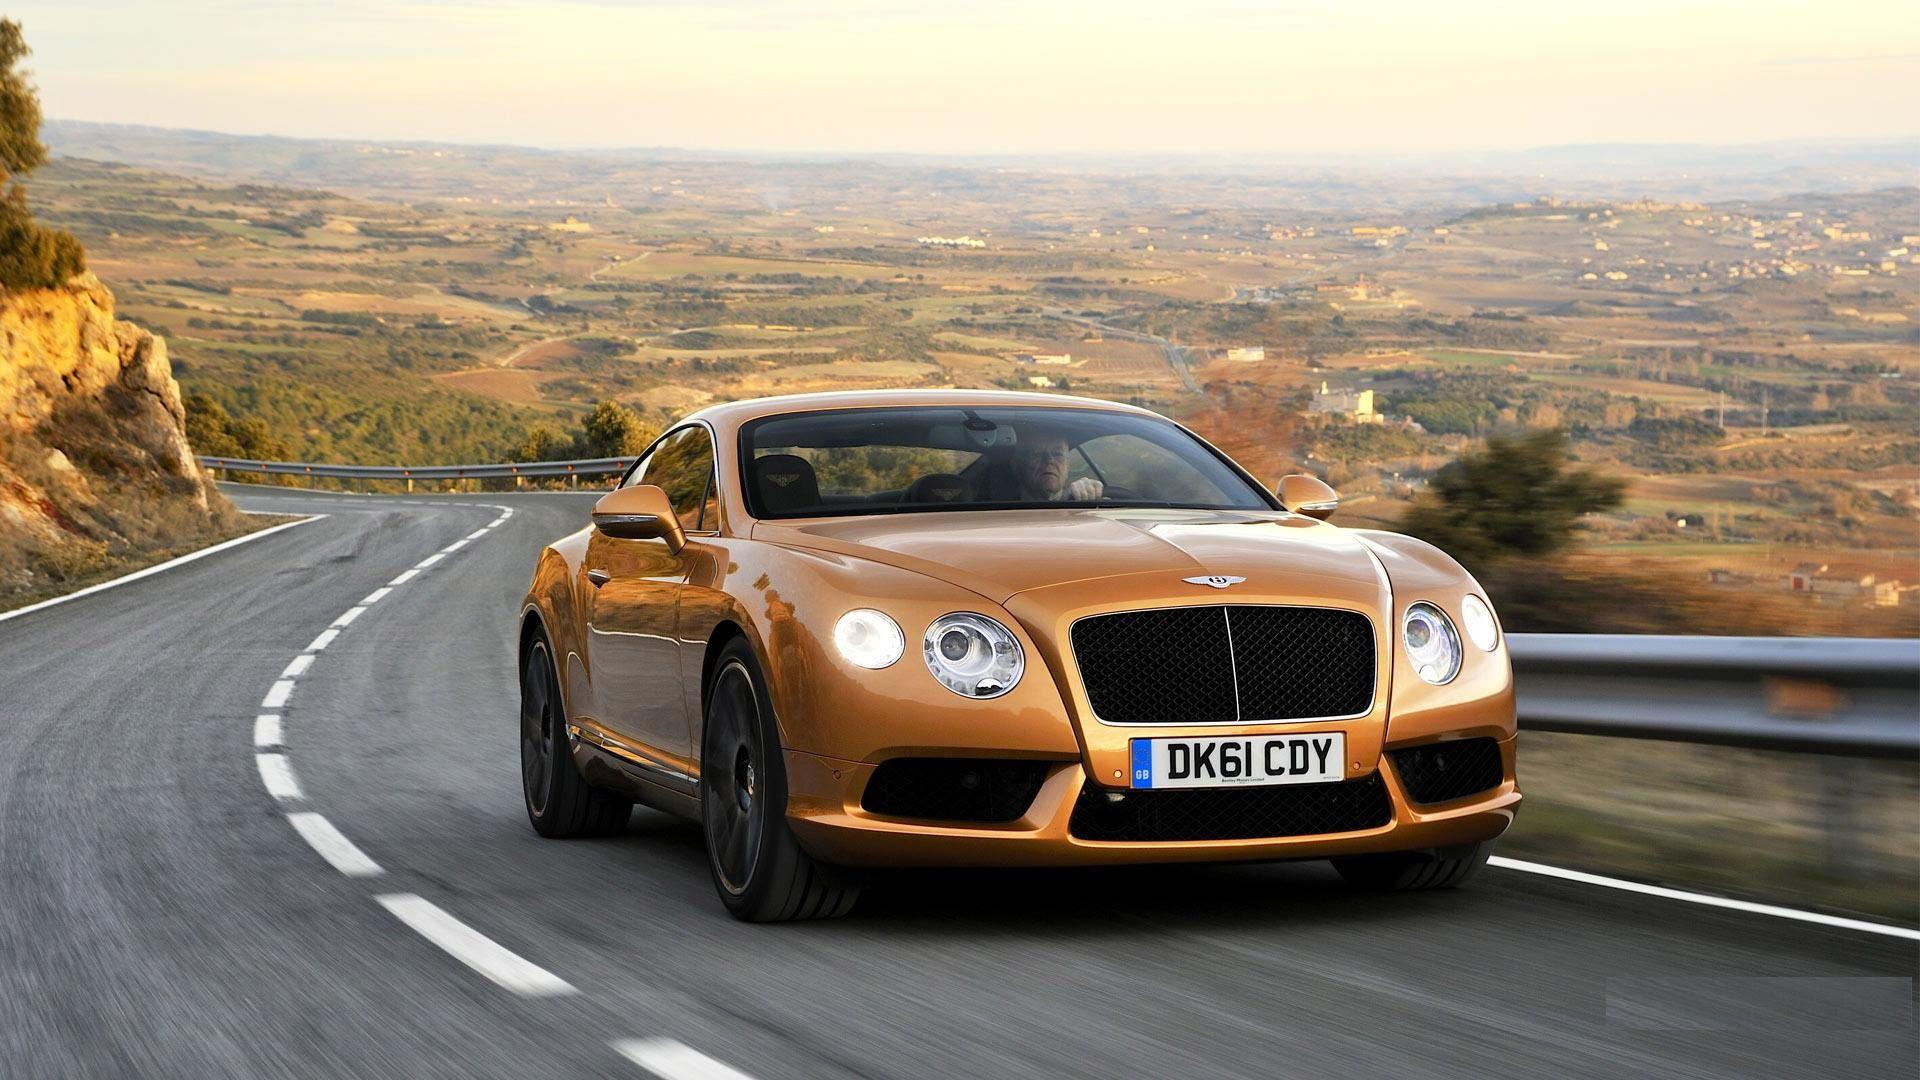 Image For Golden Bentley Continental Gt Cars Bentley Cars